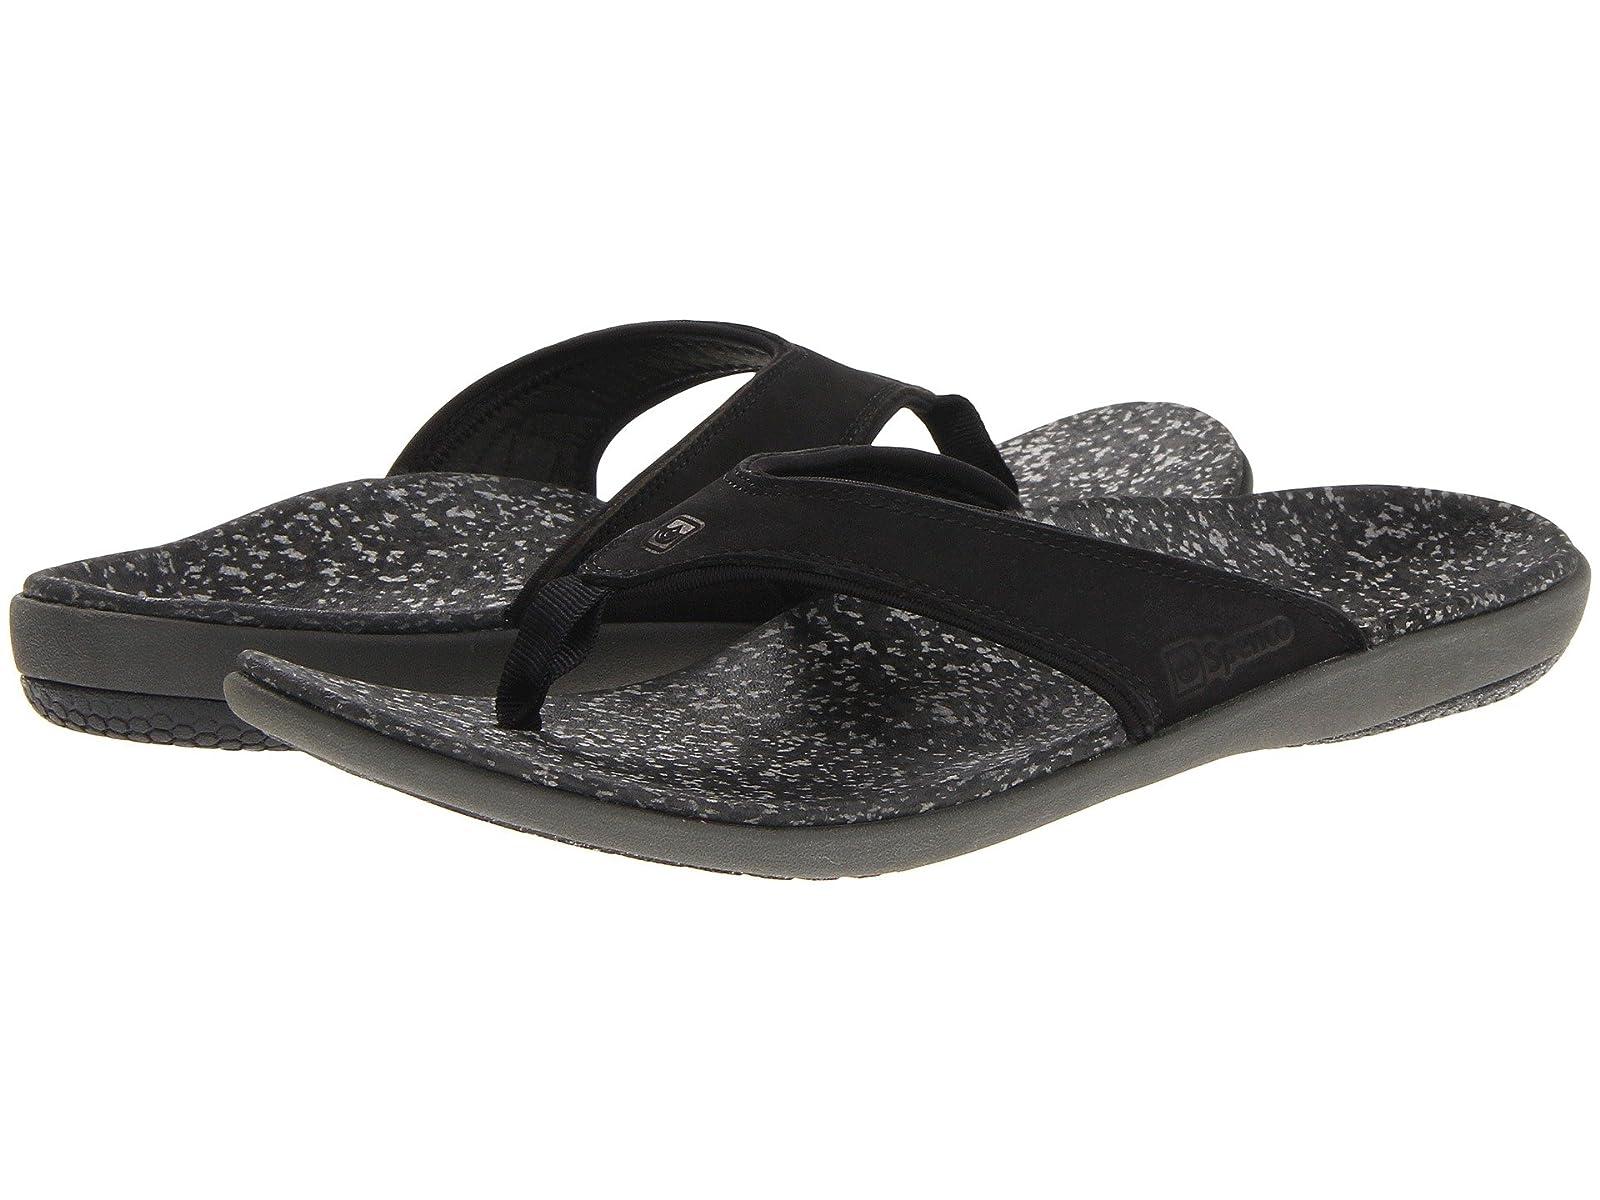 Spenco Yumi Select SandalAtmospheric grades have affordable shoes